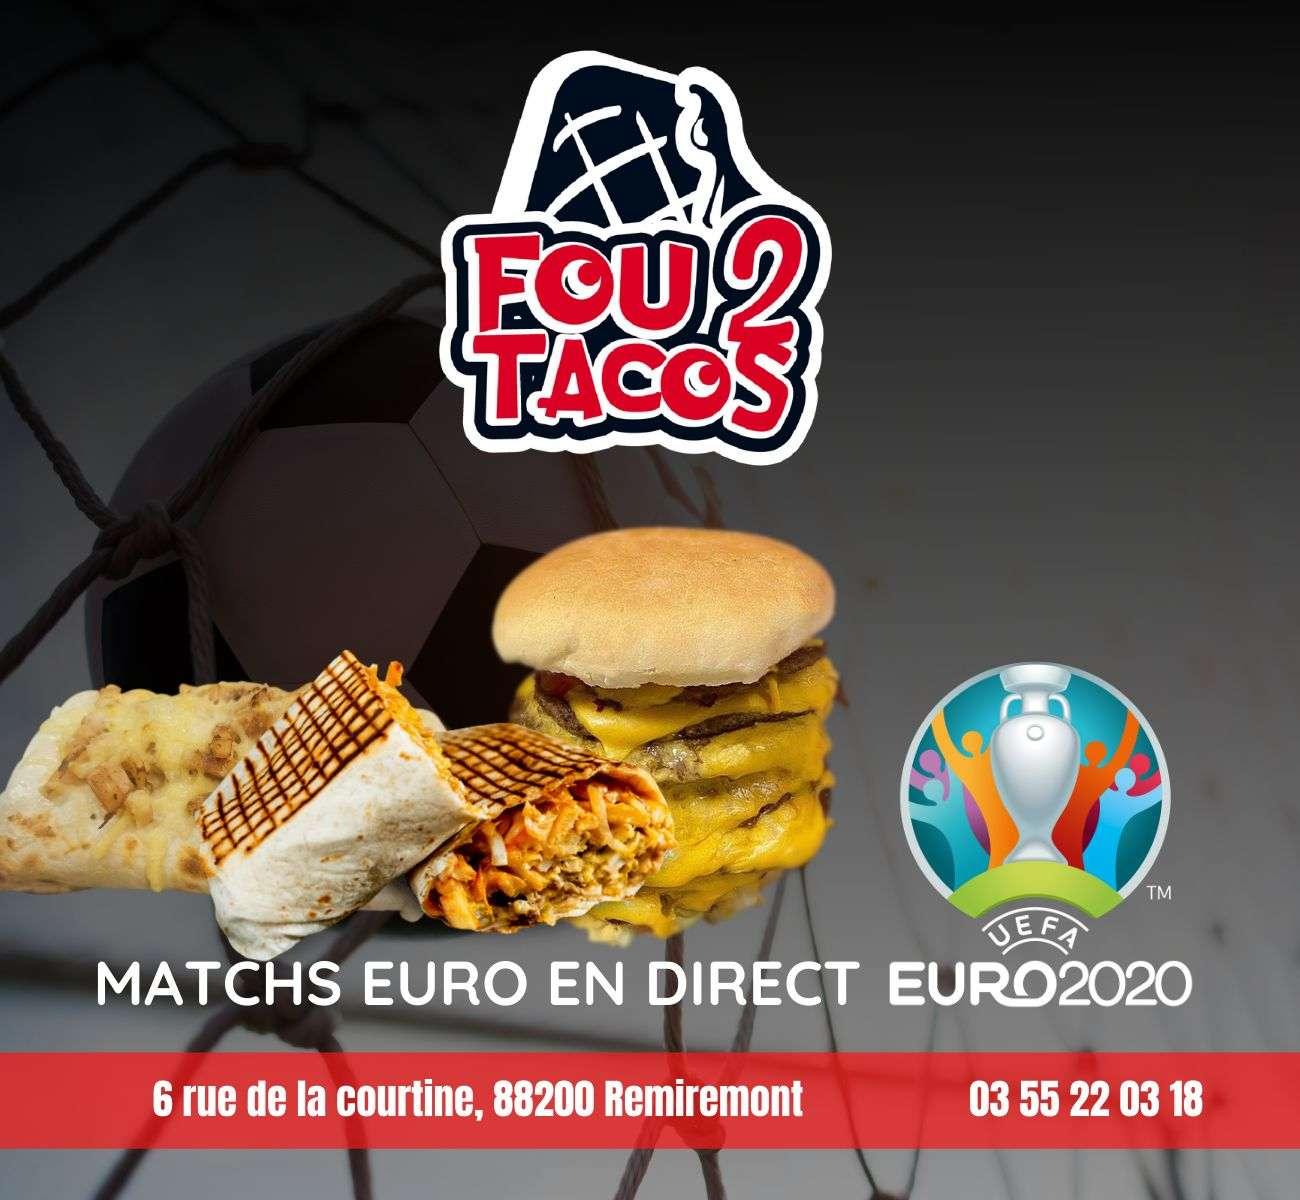 Matchs Euro 2020